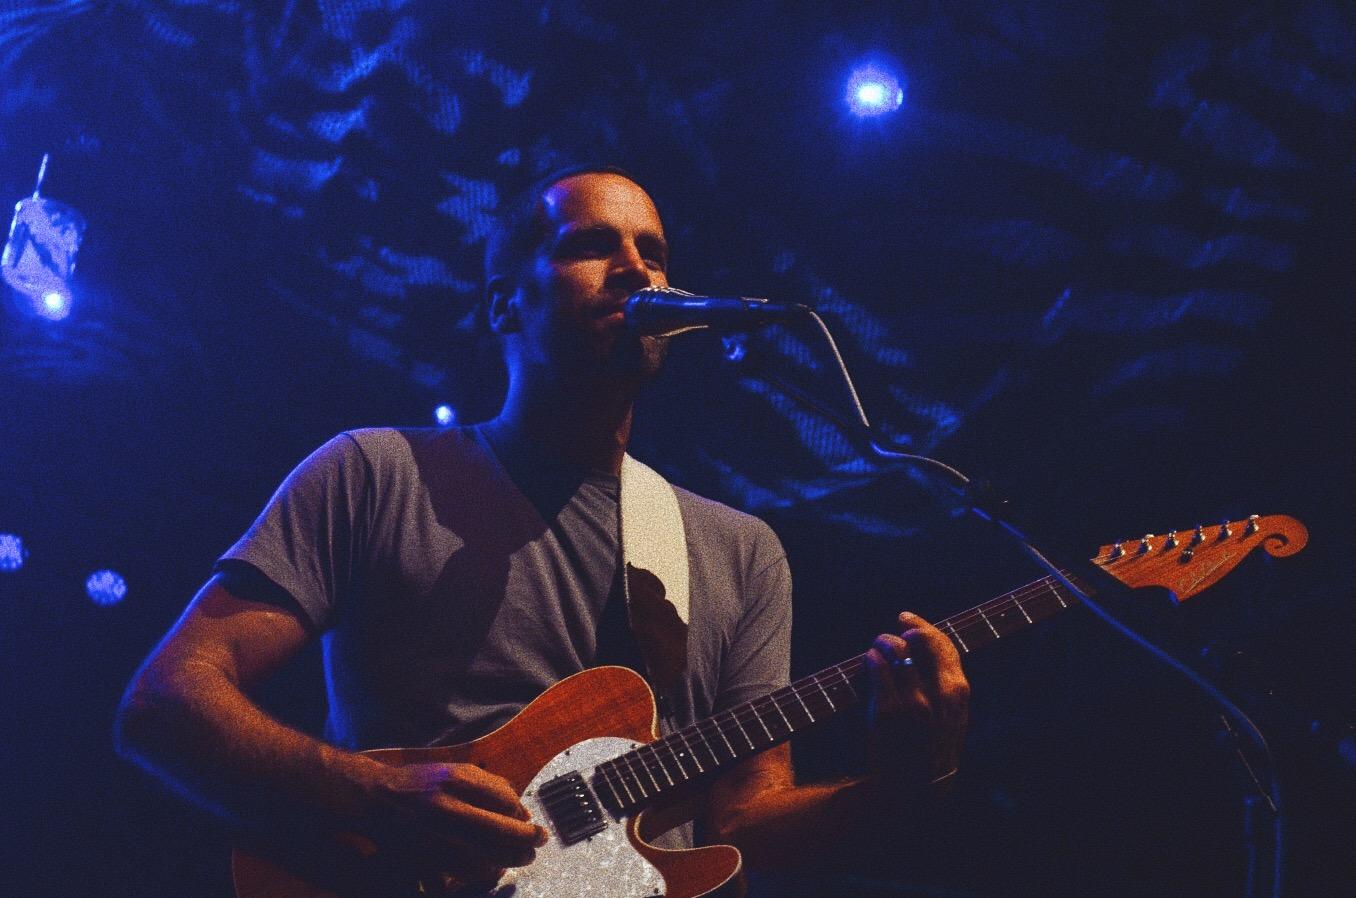 jack johnson live review melbourne photo credit ryley clarke savage thrills savagethrills 6